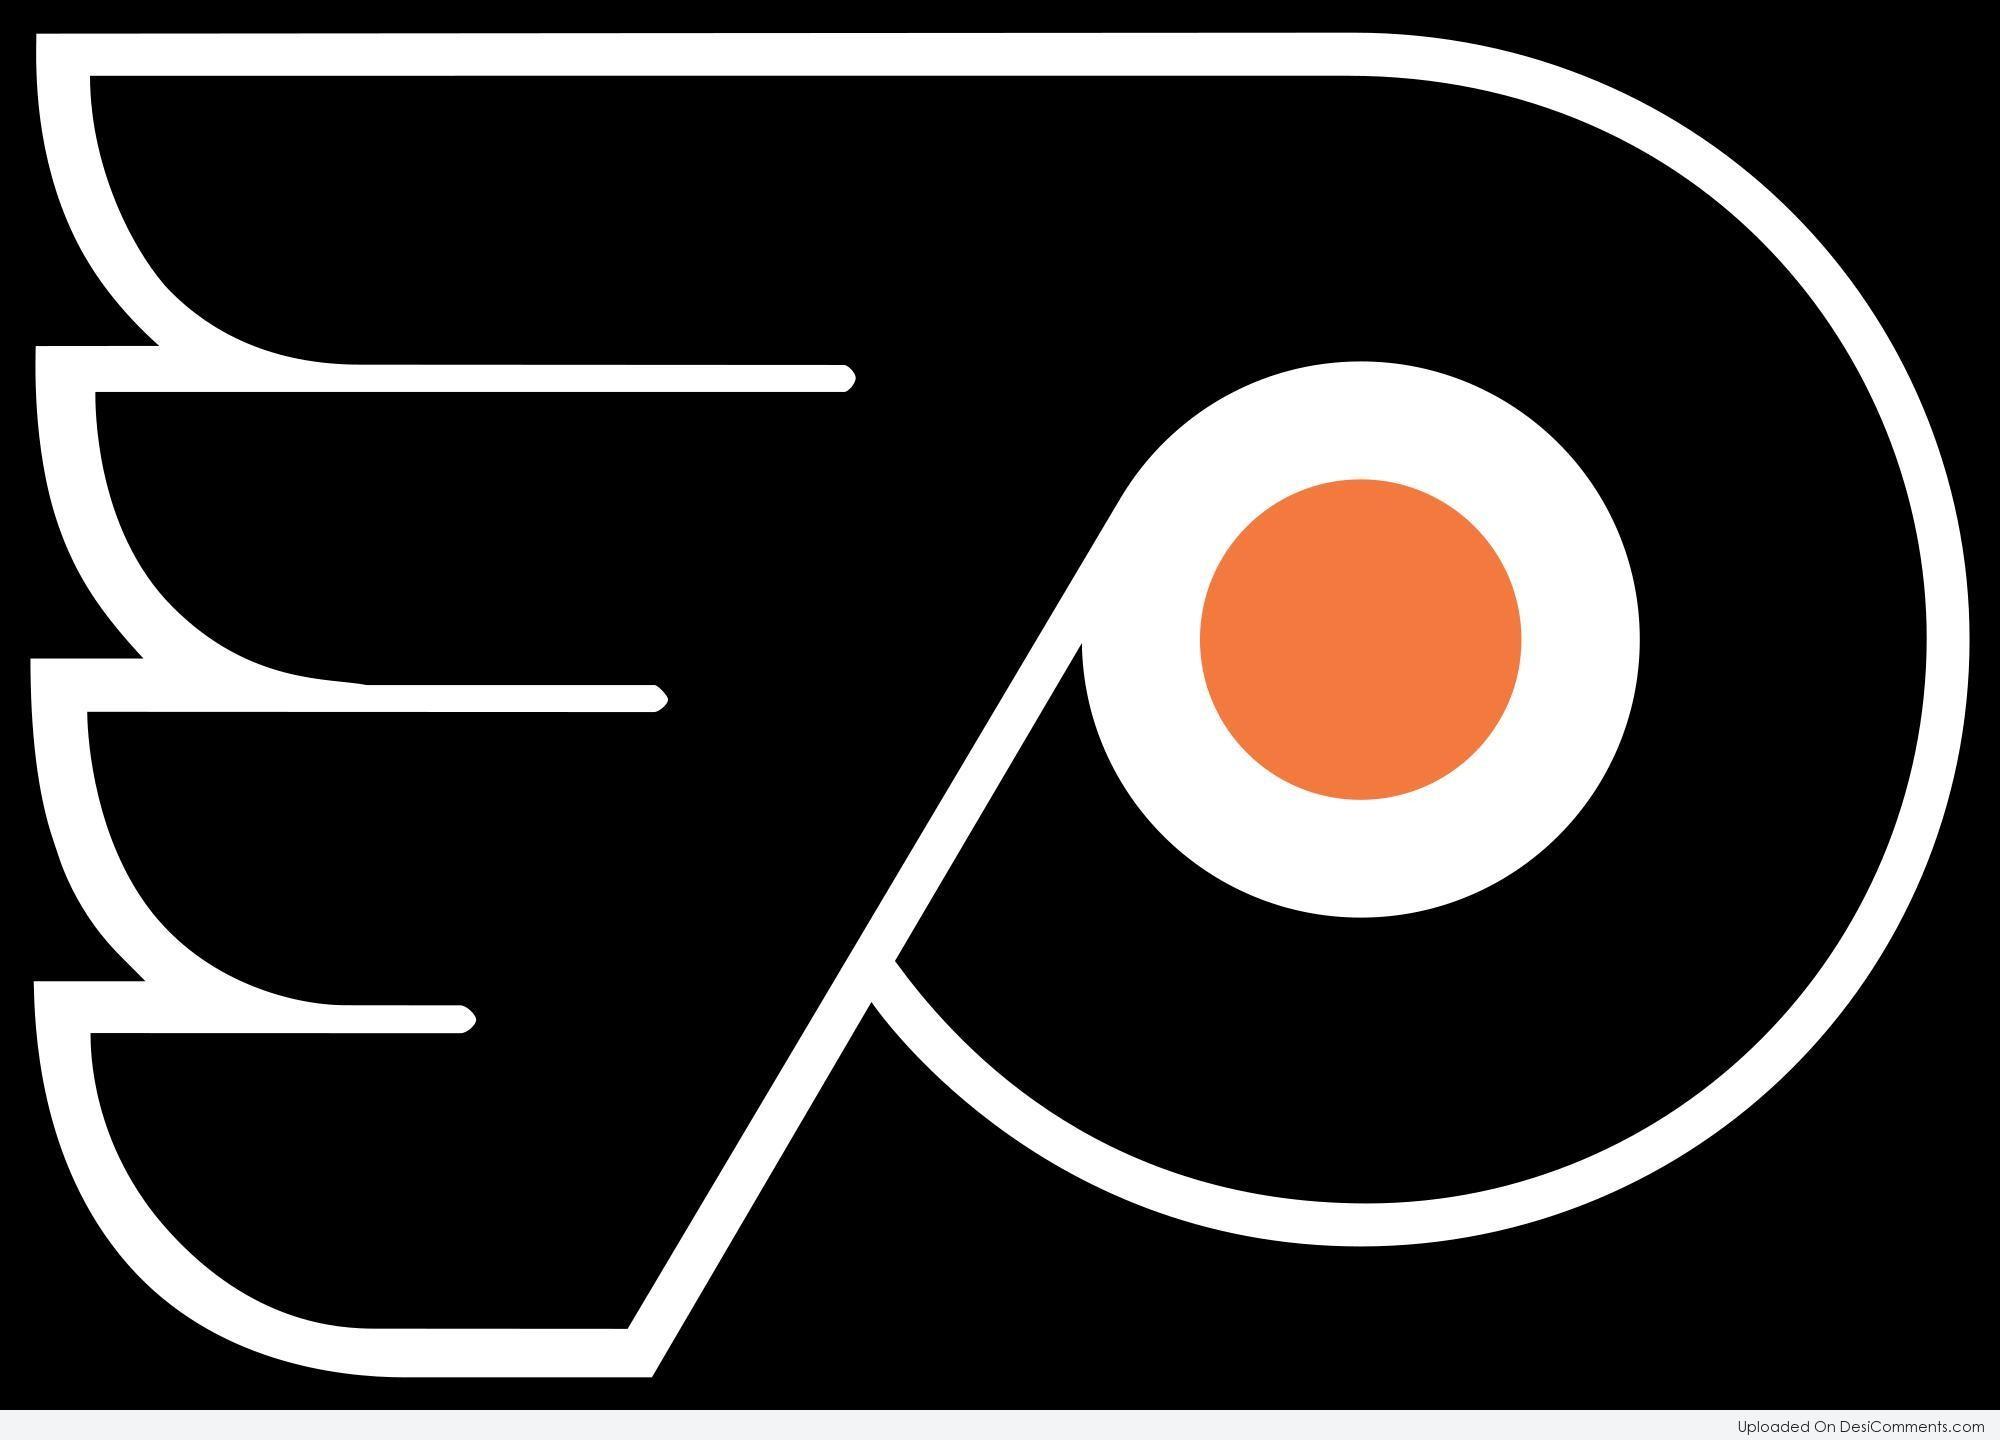 Philadelphia Flyers Logo   DesiComments.com